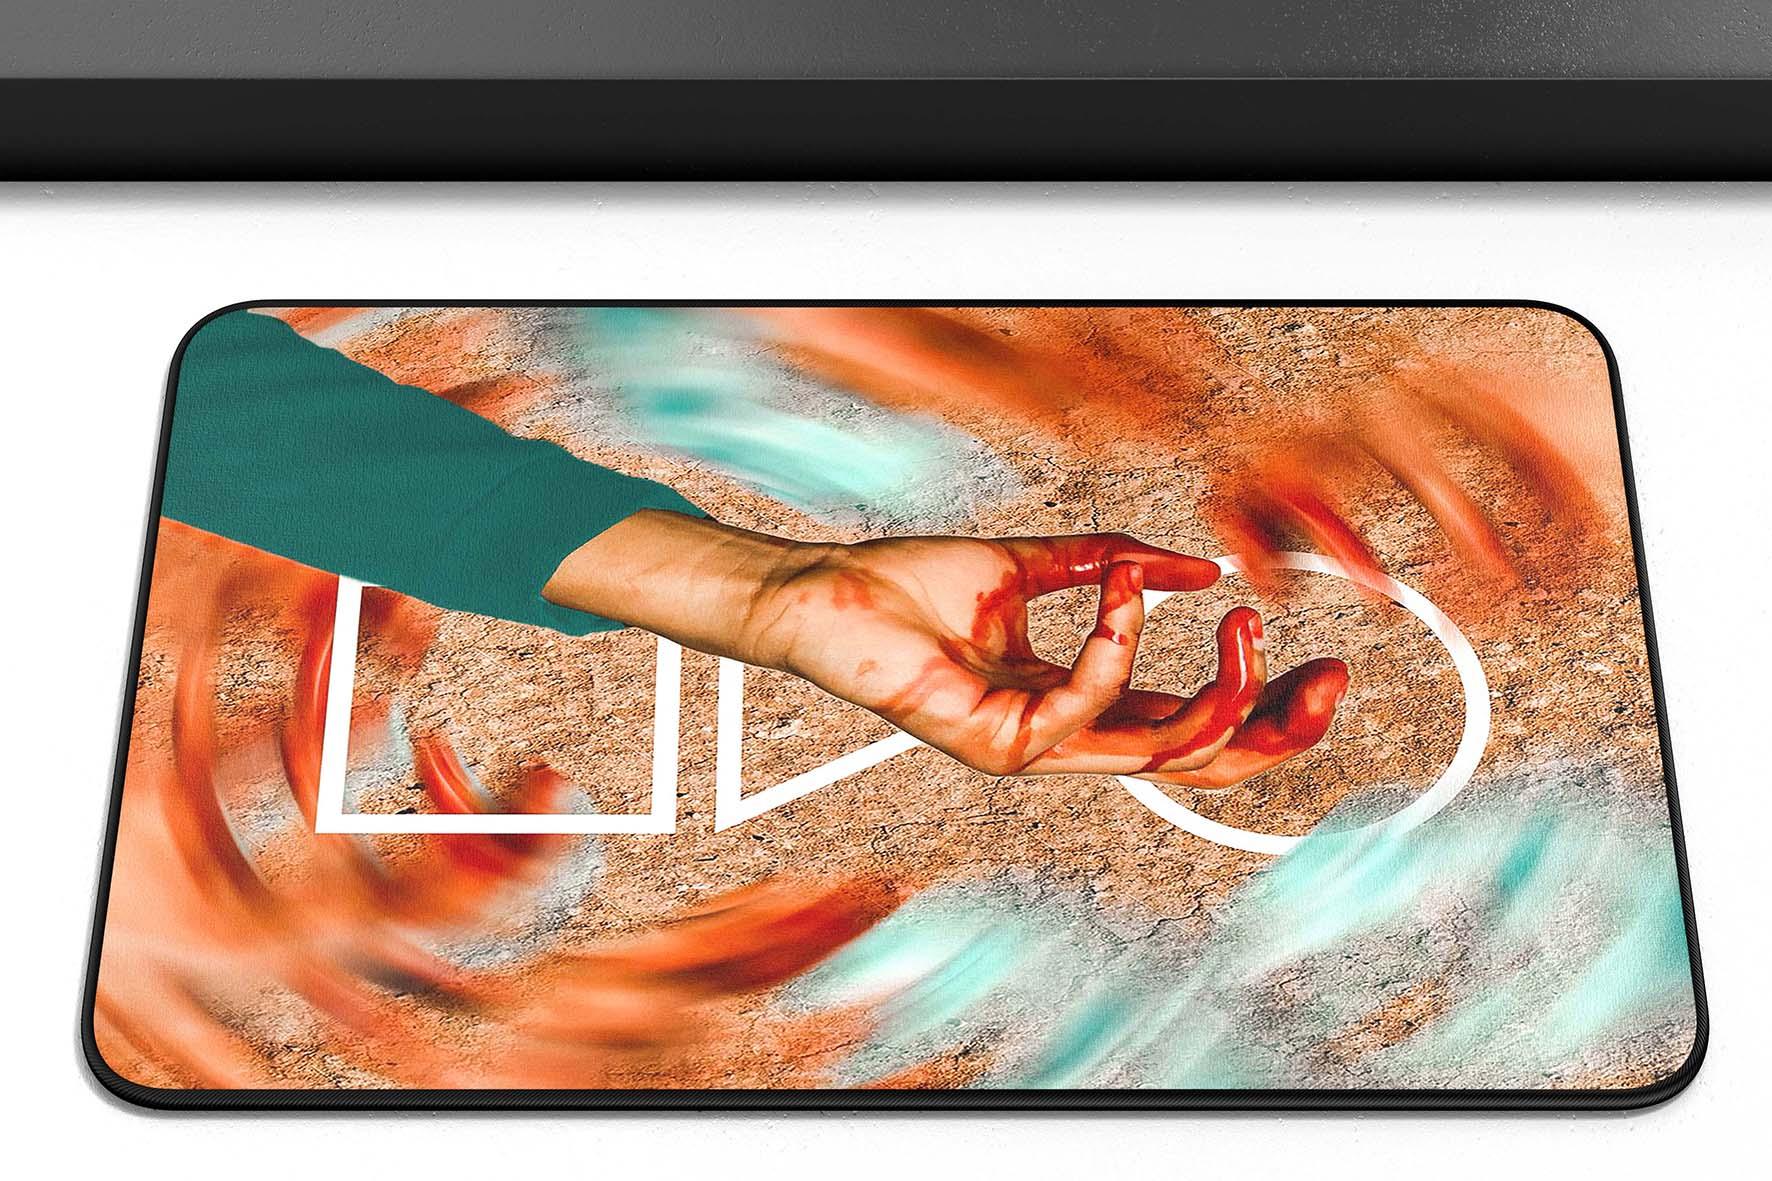 Tapete Capacho Poliéster Round 6 Squid Game Símbolos Mão Netflix - EV